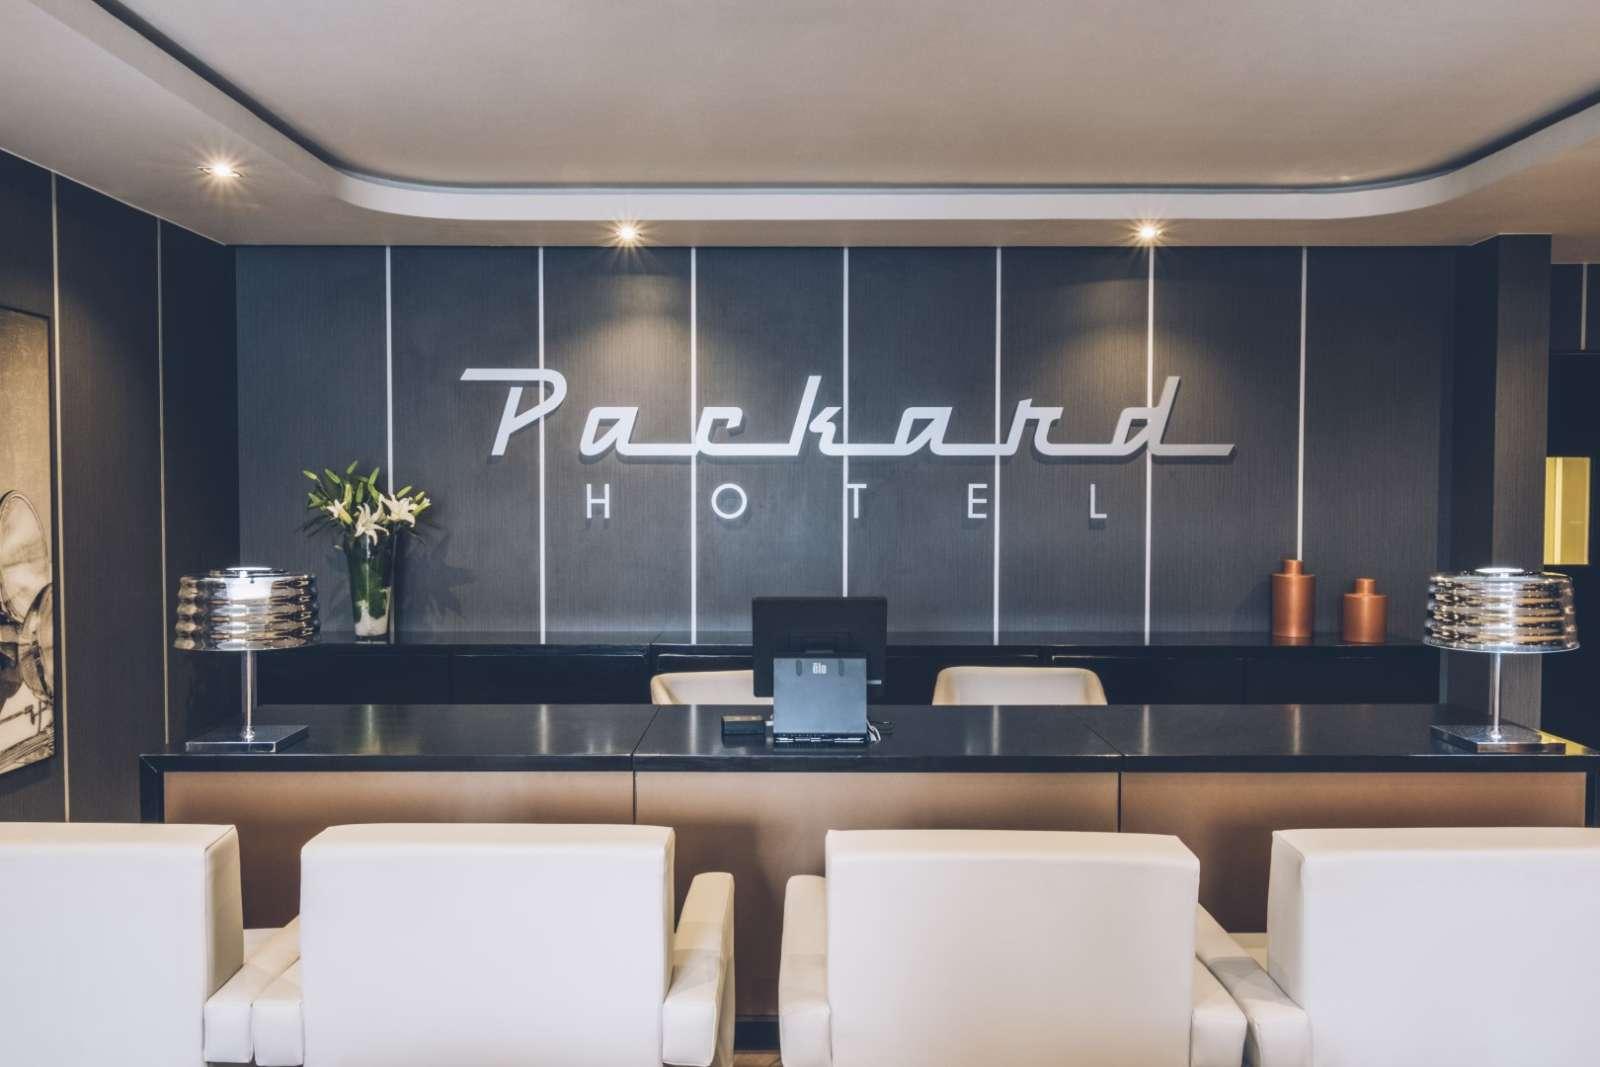 Reception at the Iberostar Packard hotel in Havana, Cuba